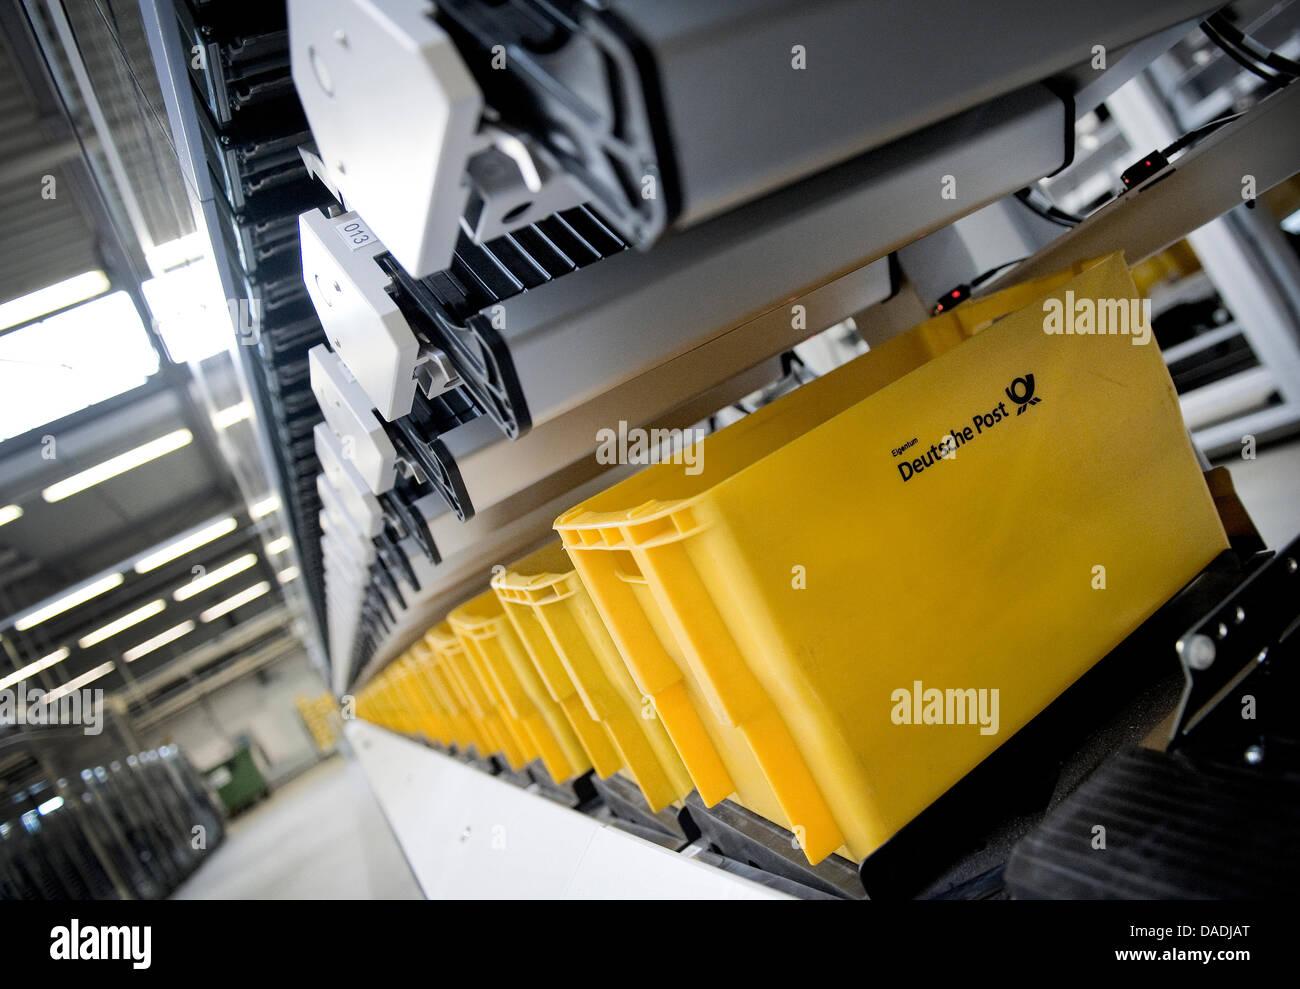 mail sorting machine stockfotos mail sorting machine bilder alamy. Black Bedroom Furniture Sets. Home Design Ideas